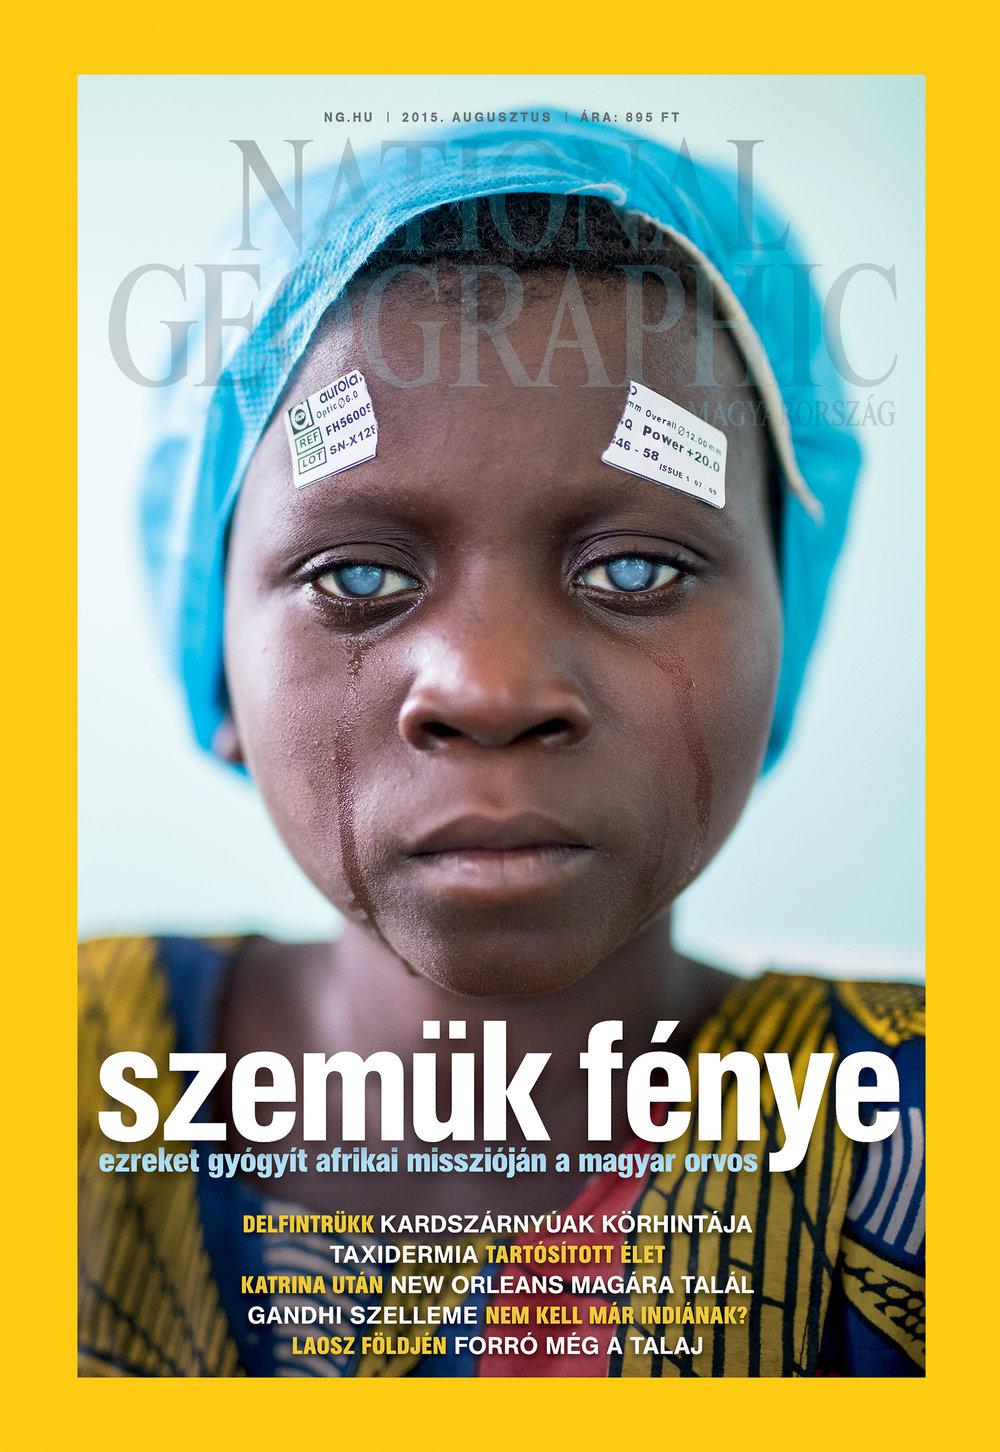 Cataract_COVkicsi.jpg